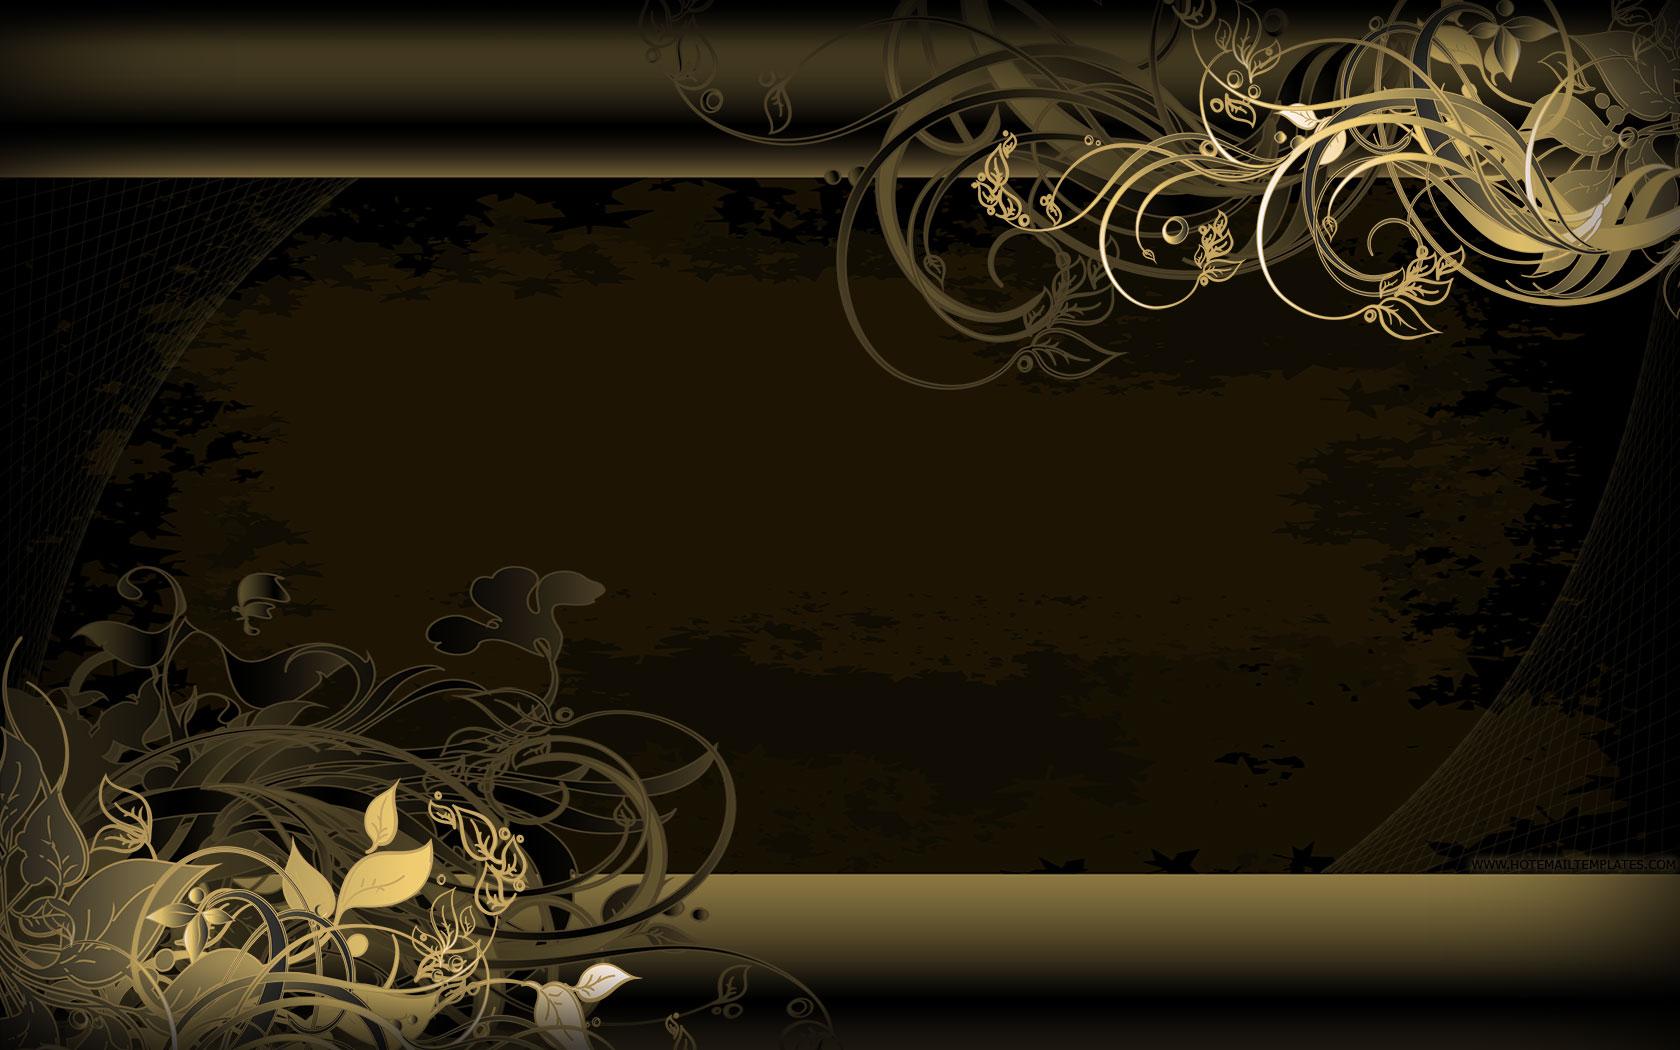 Black And Gold Vintage Wallpaper WallpaperHDCcom 1680x1050